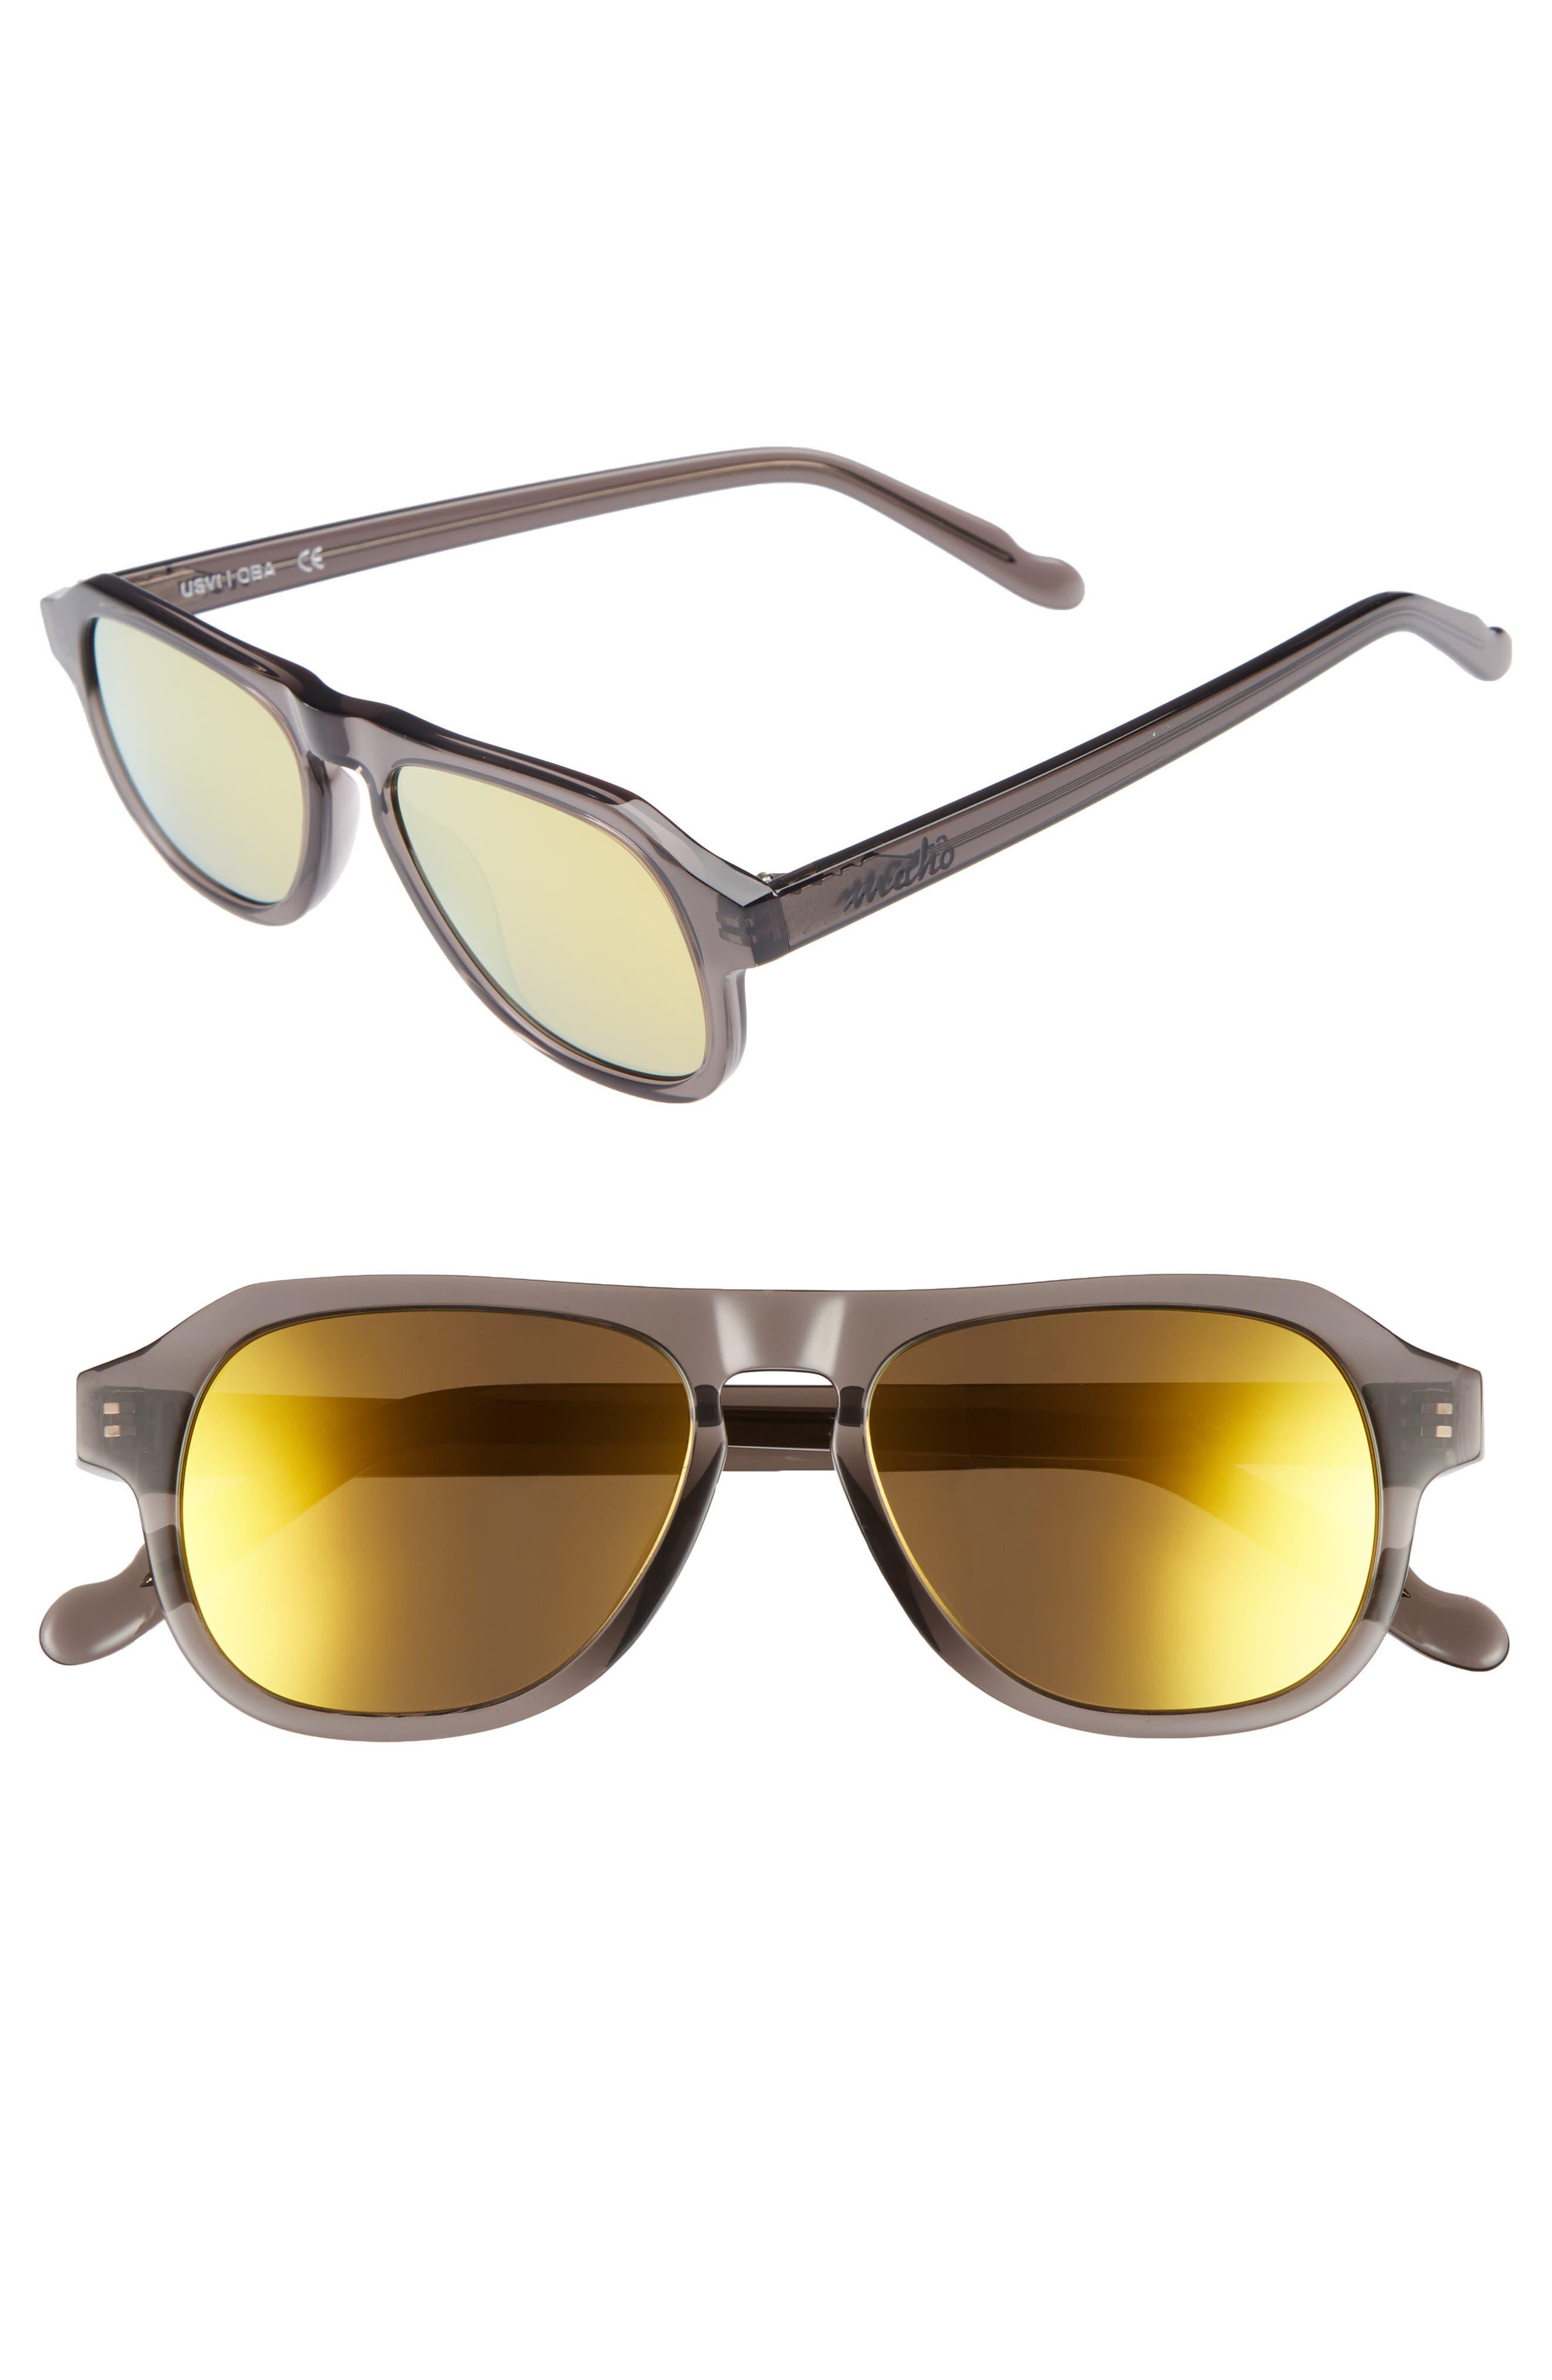 Galapagos 48mm Polarized Flat Top Sunglasses,                             Main thumbnail 1, color,                             020